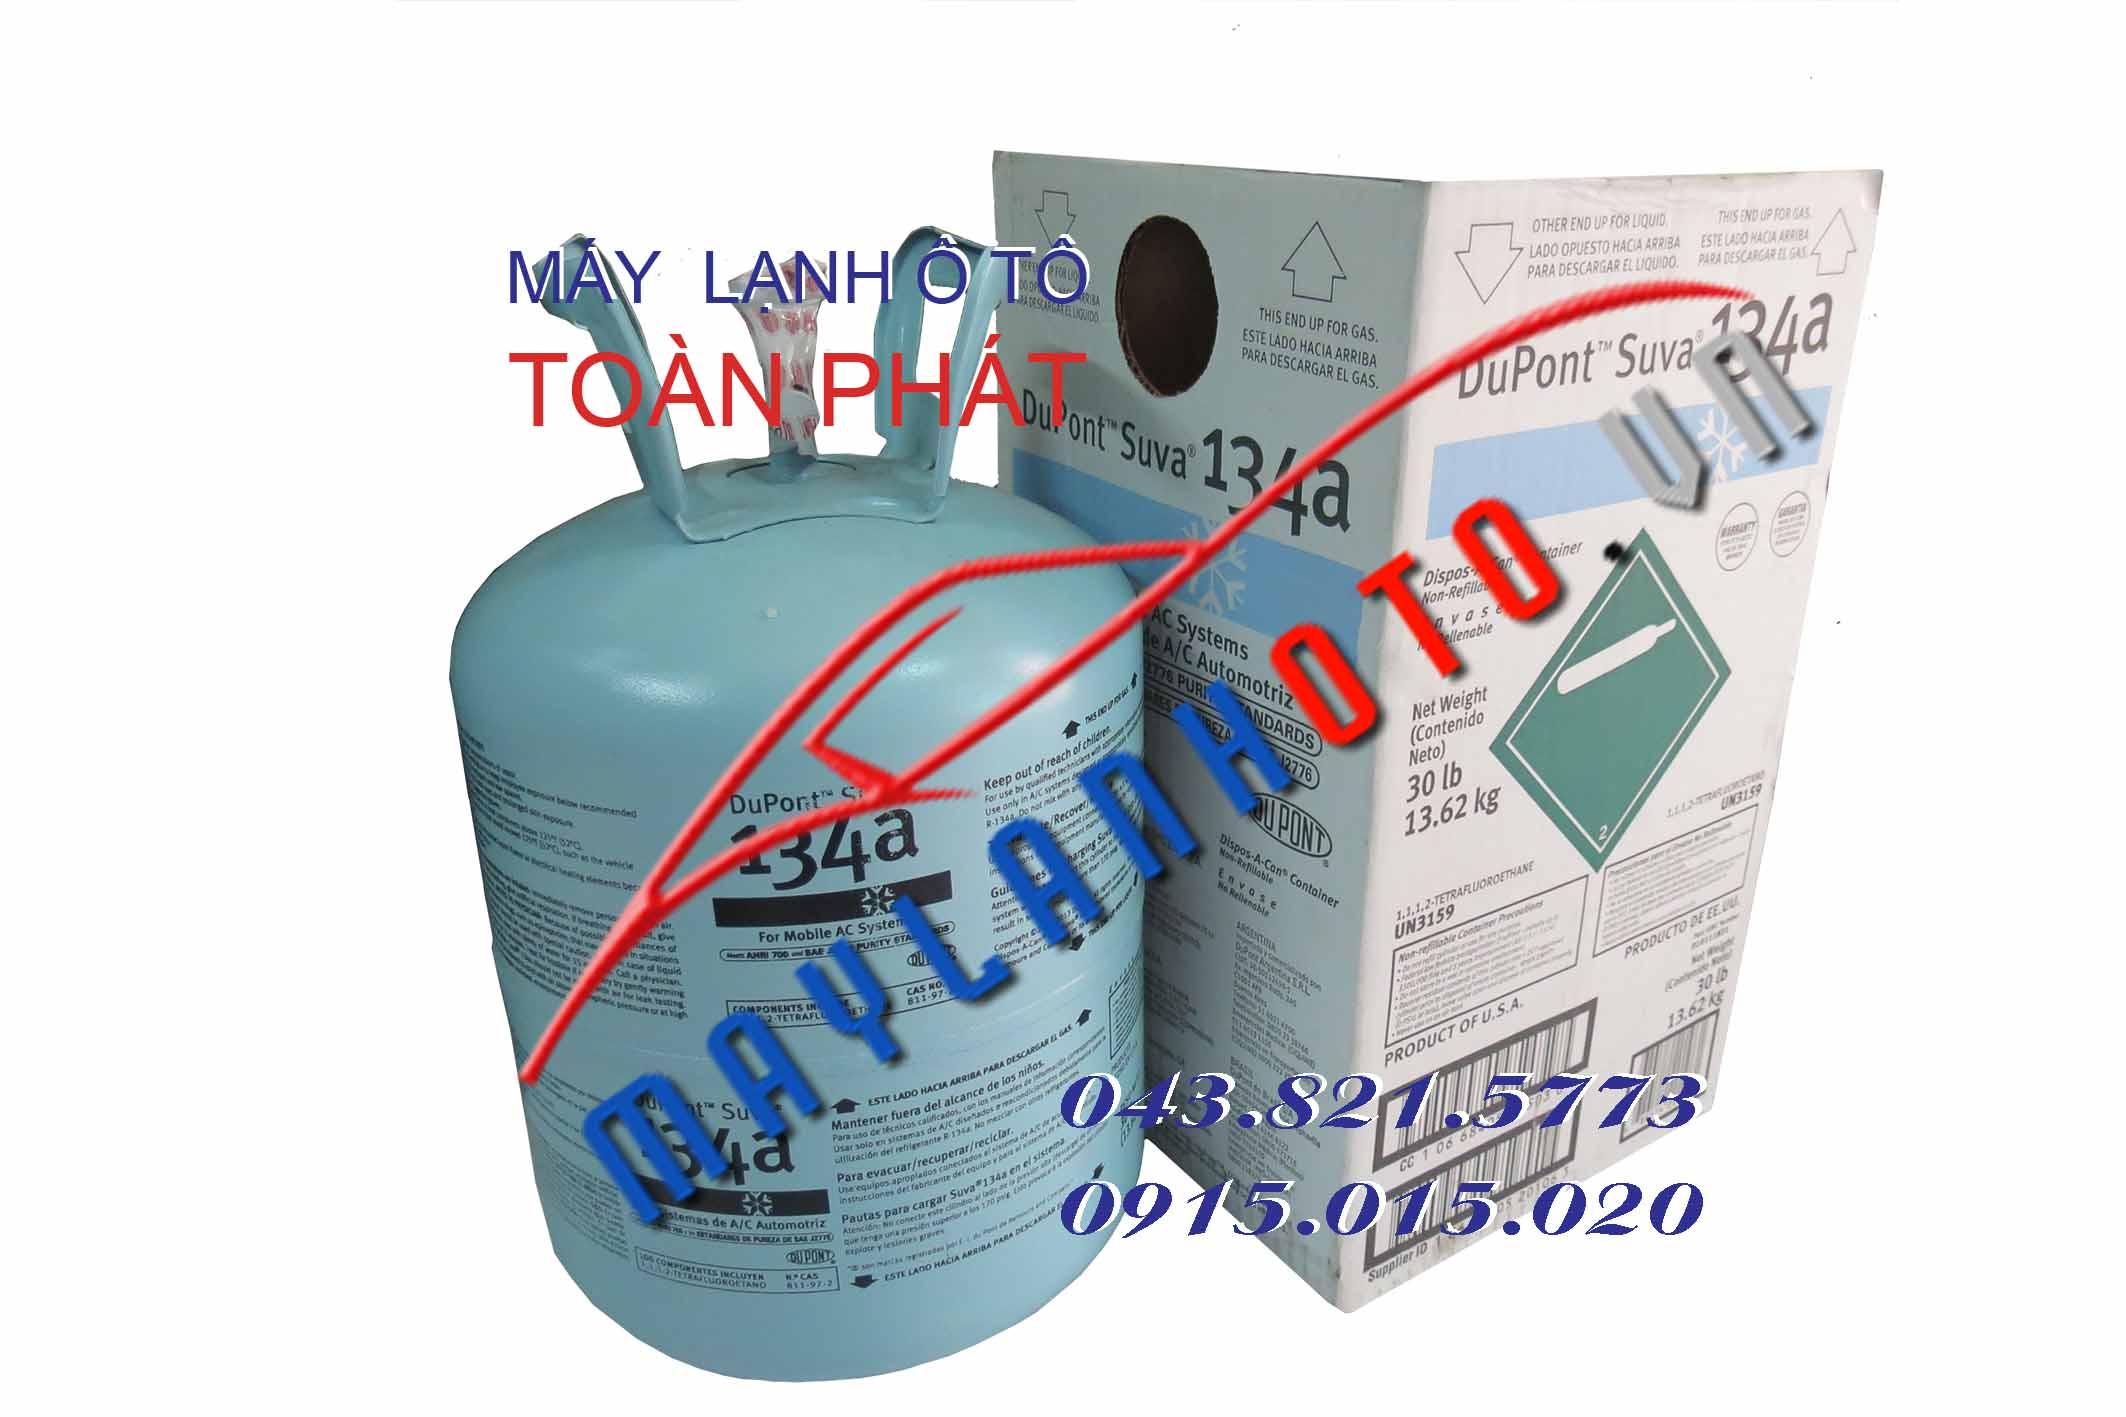 Gas 134 Dupont Suva